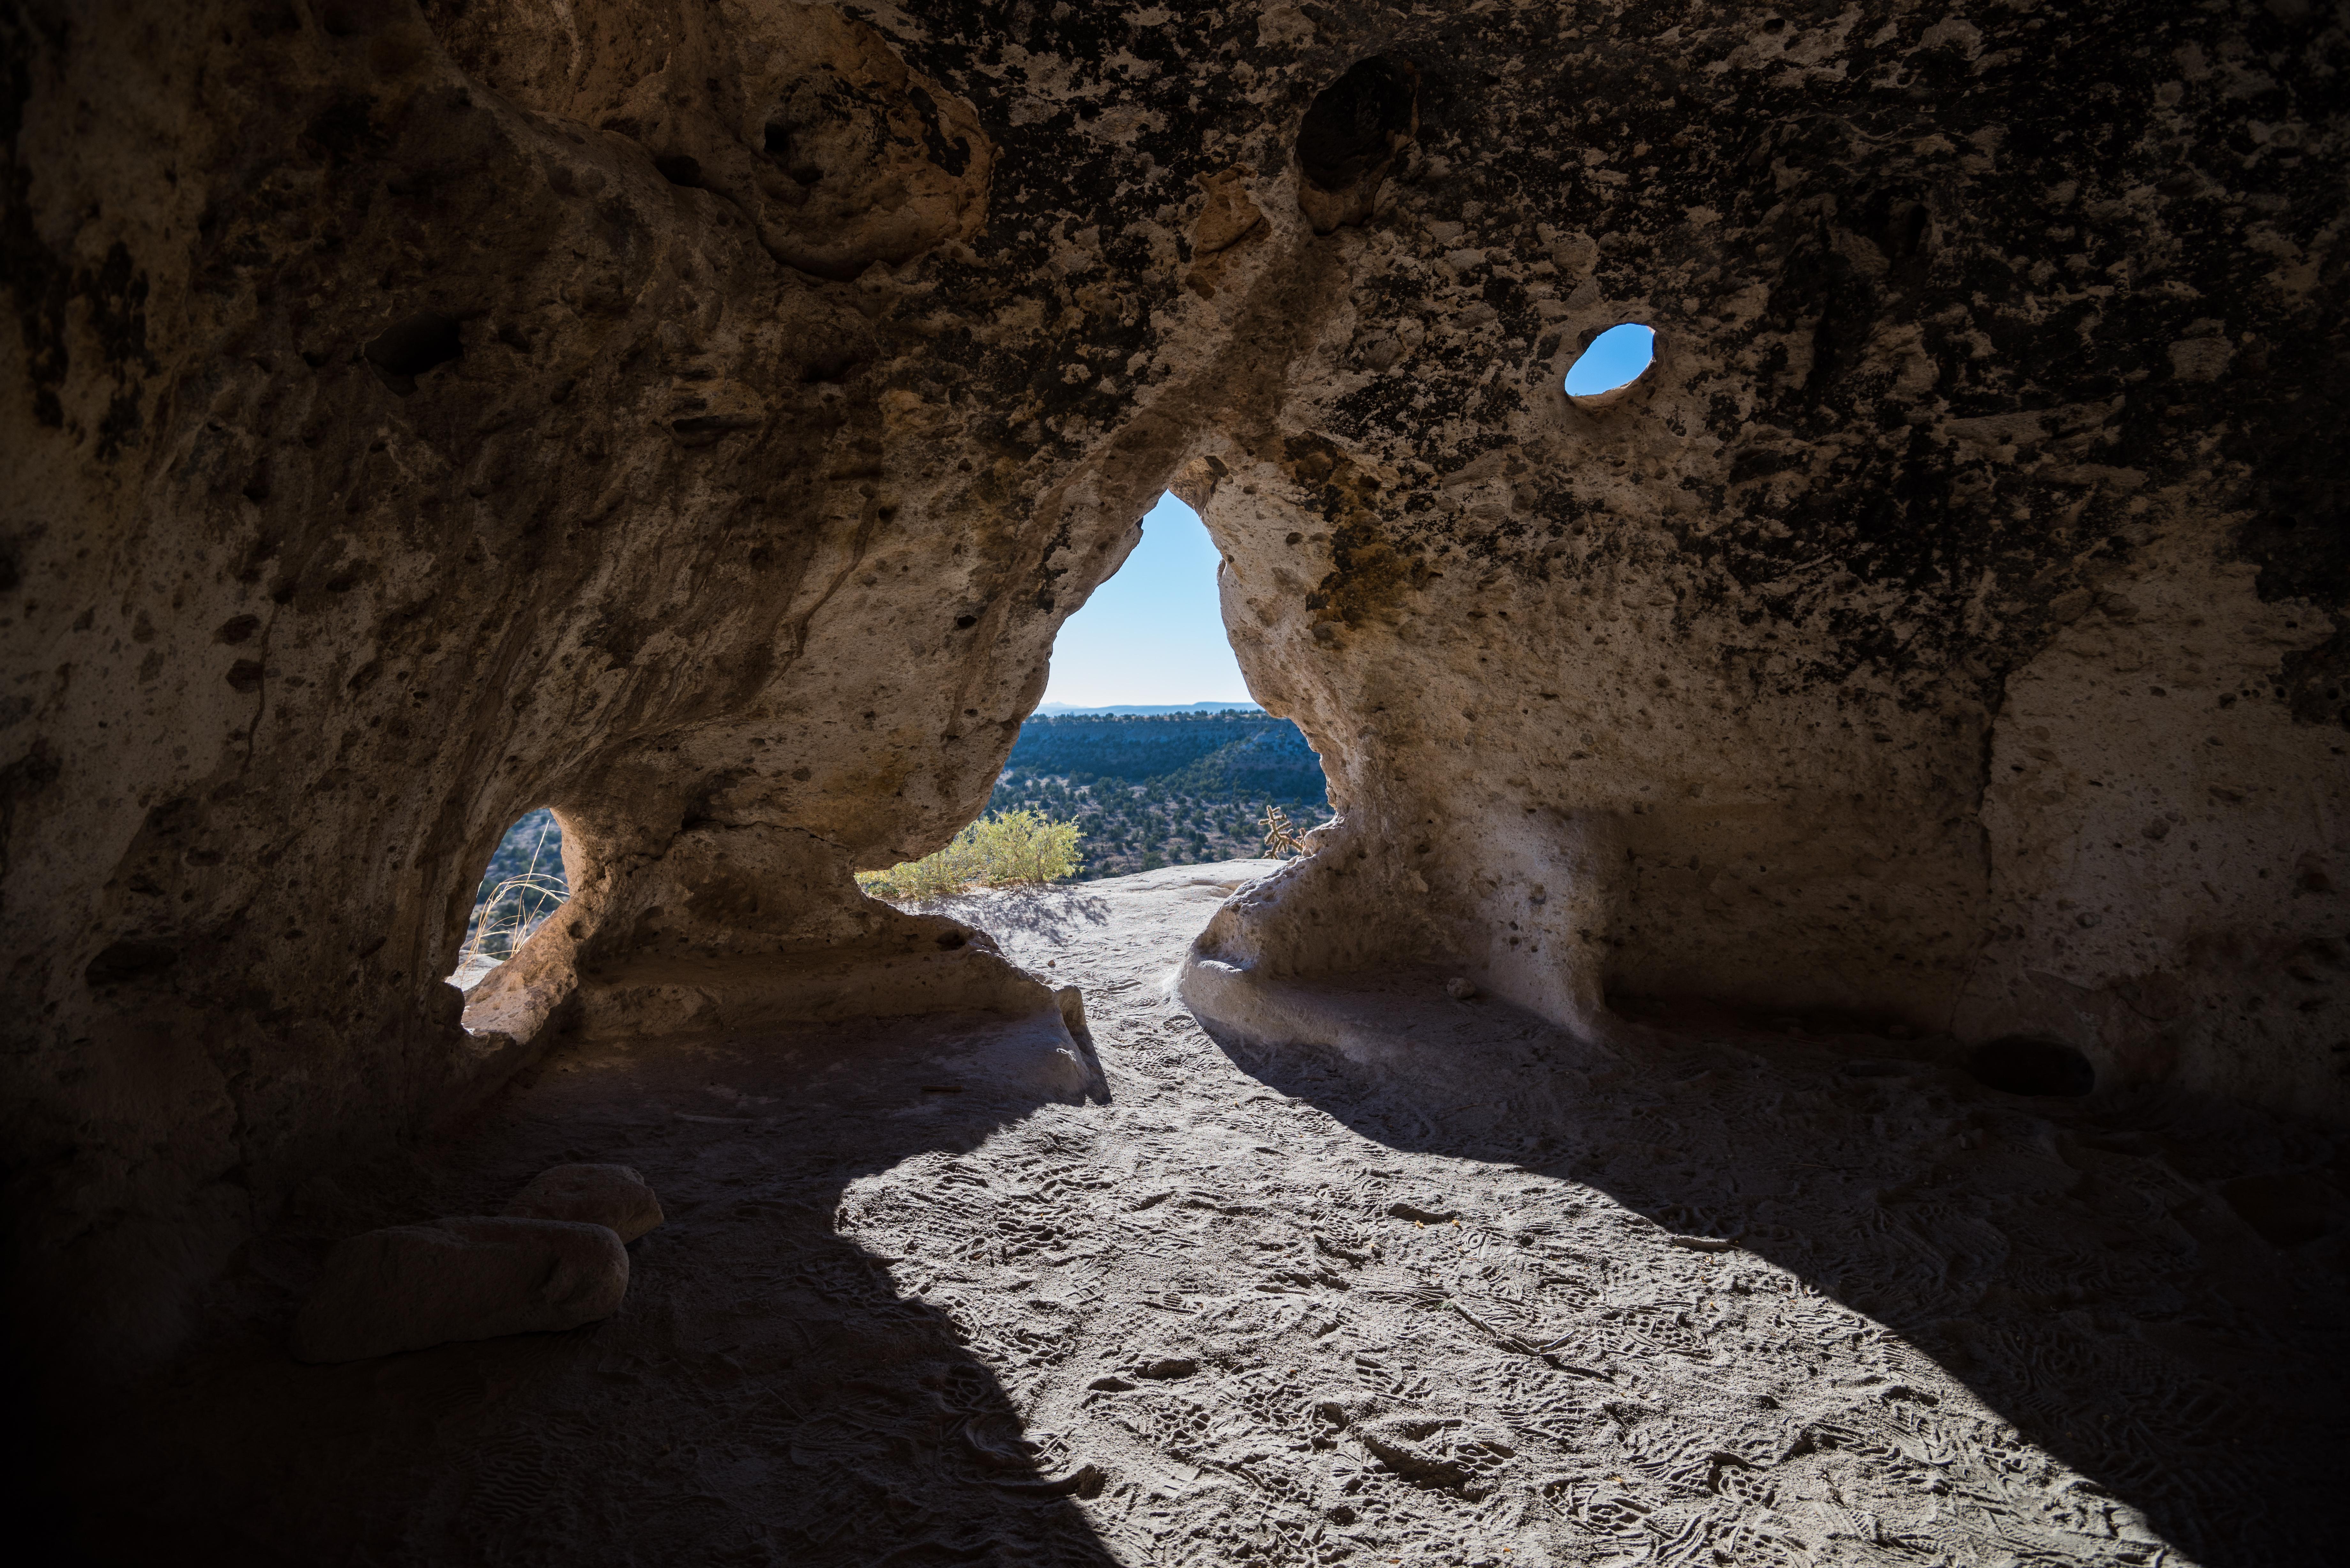 Vivid Cave Dwelling